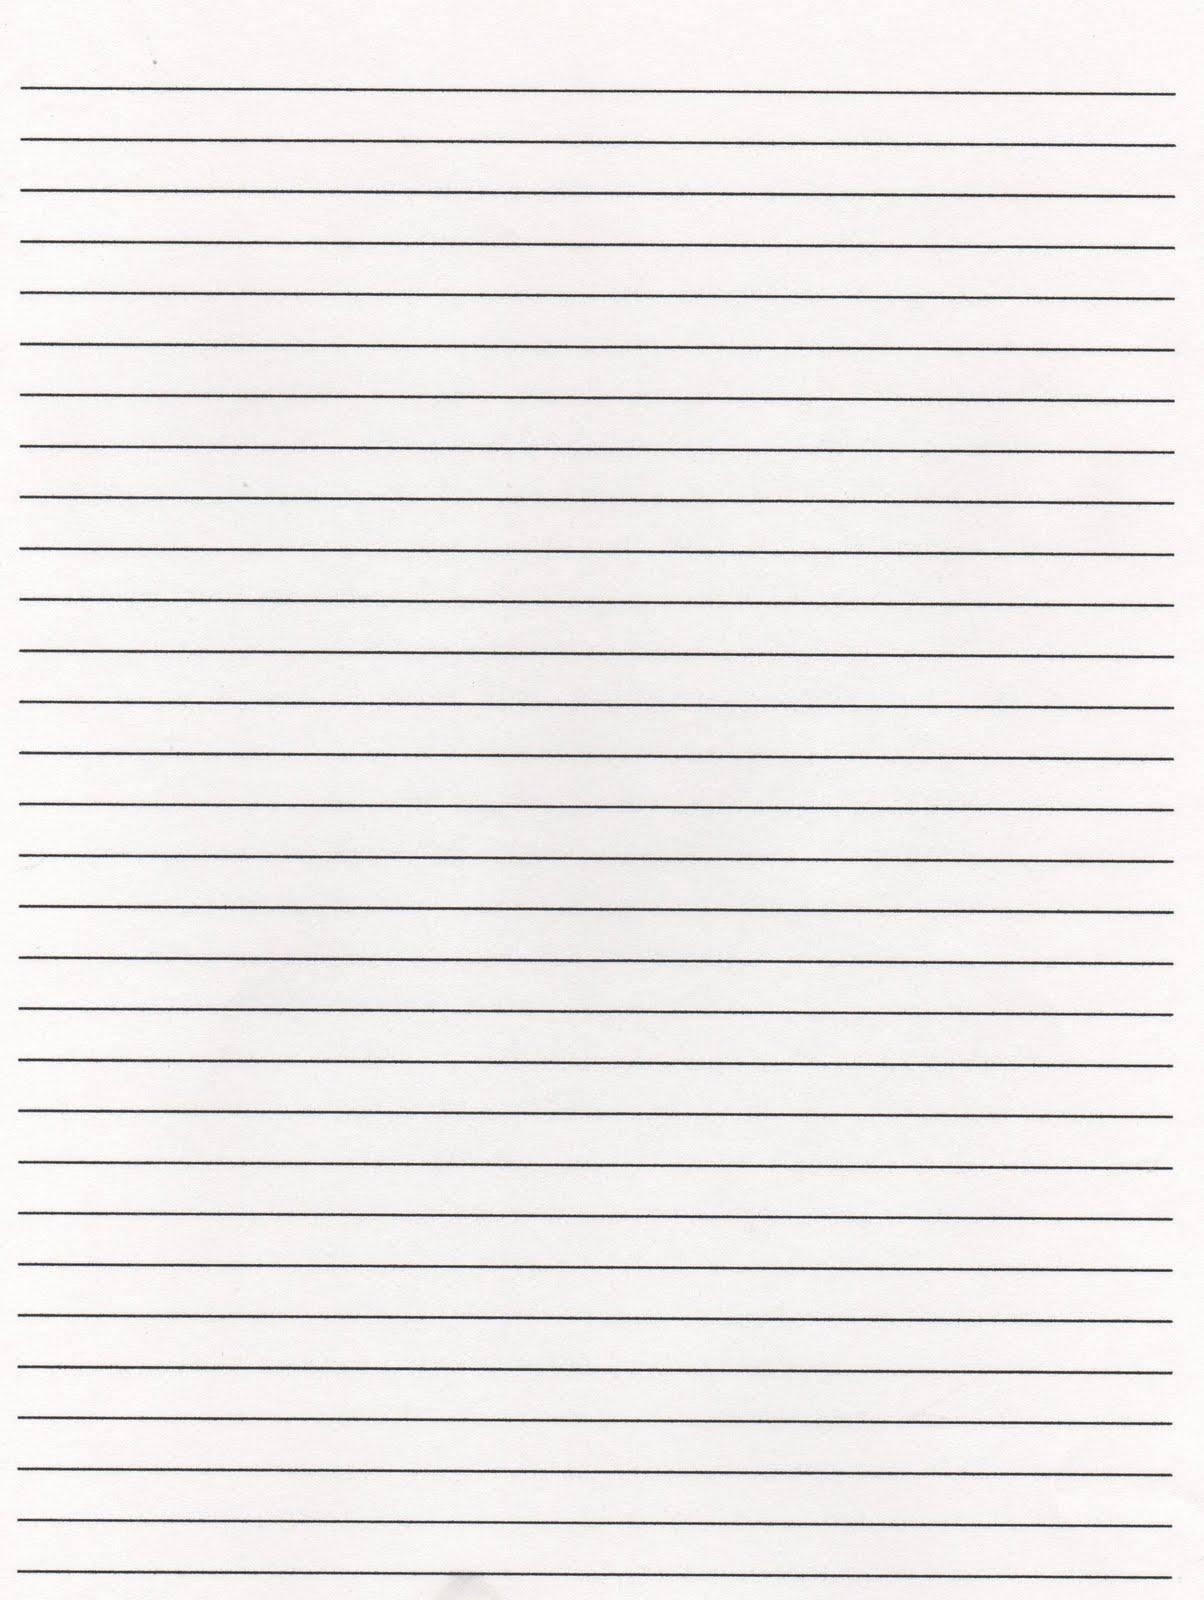 Elementary School Enrichment Activities Lined Paper